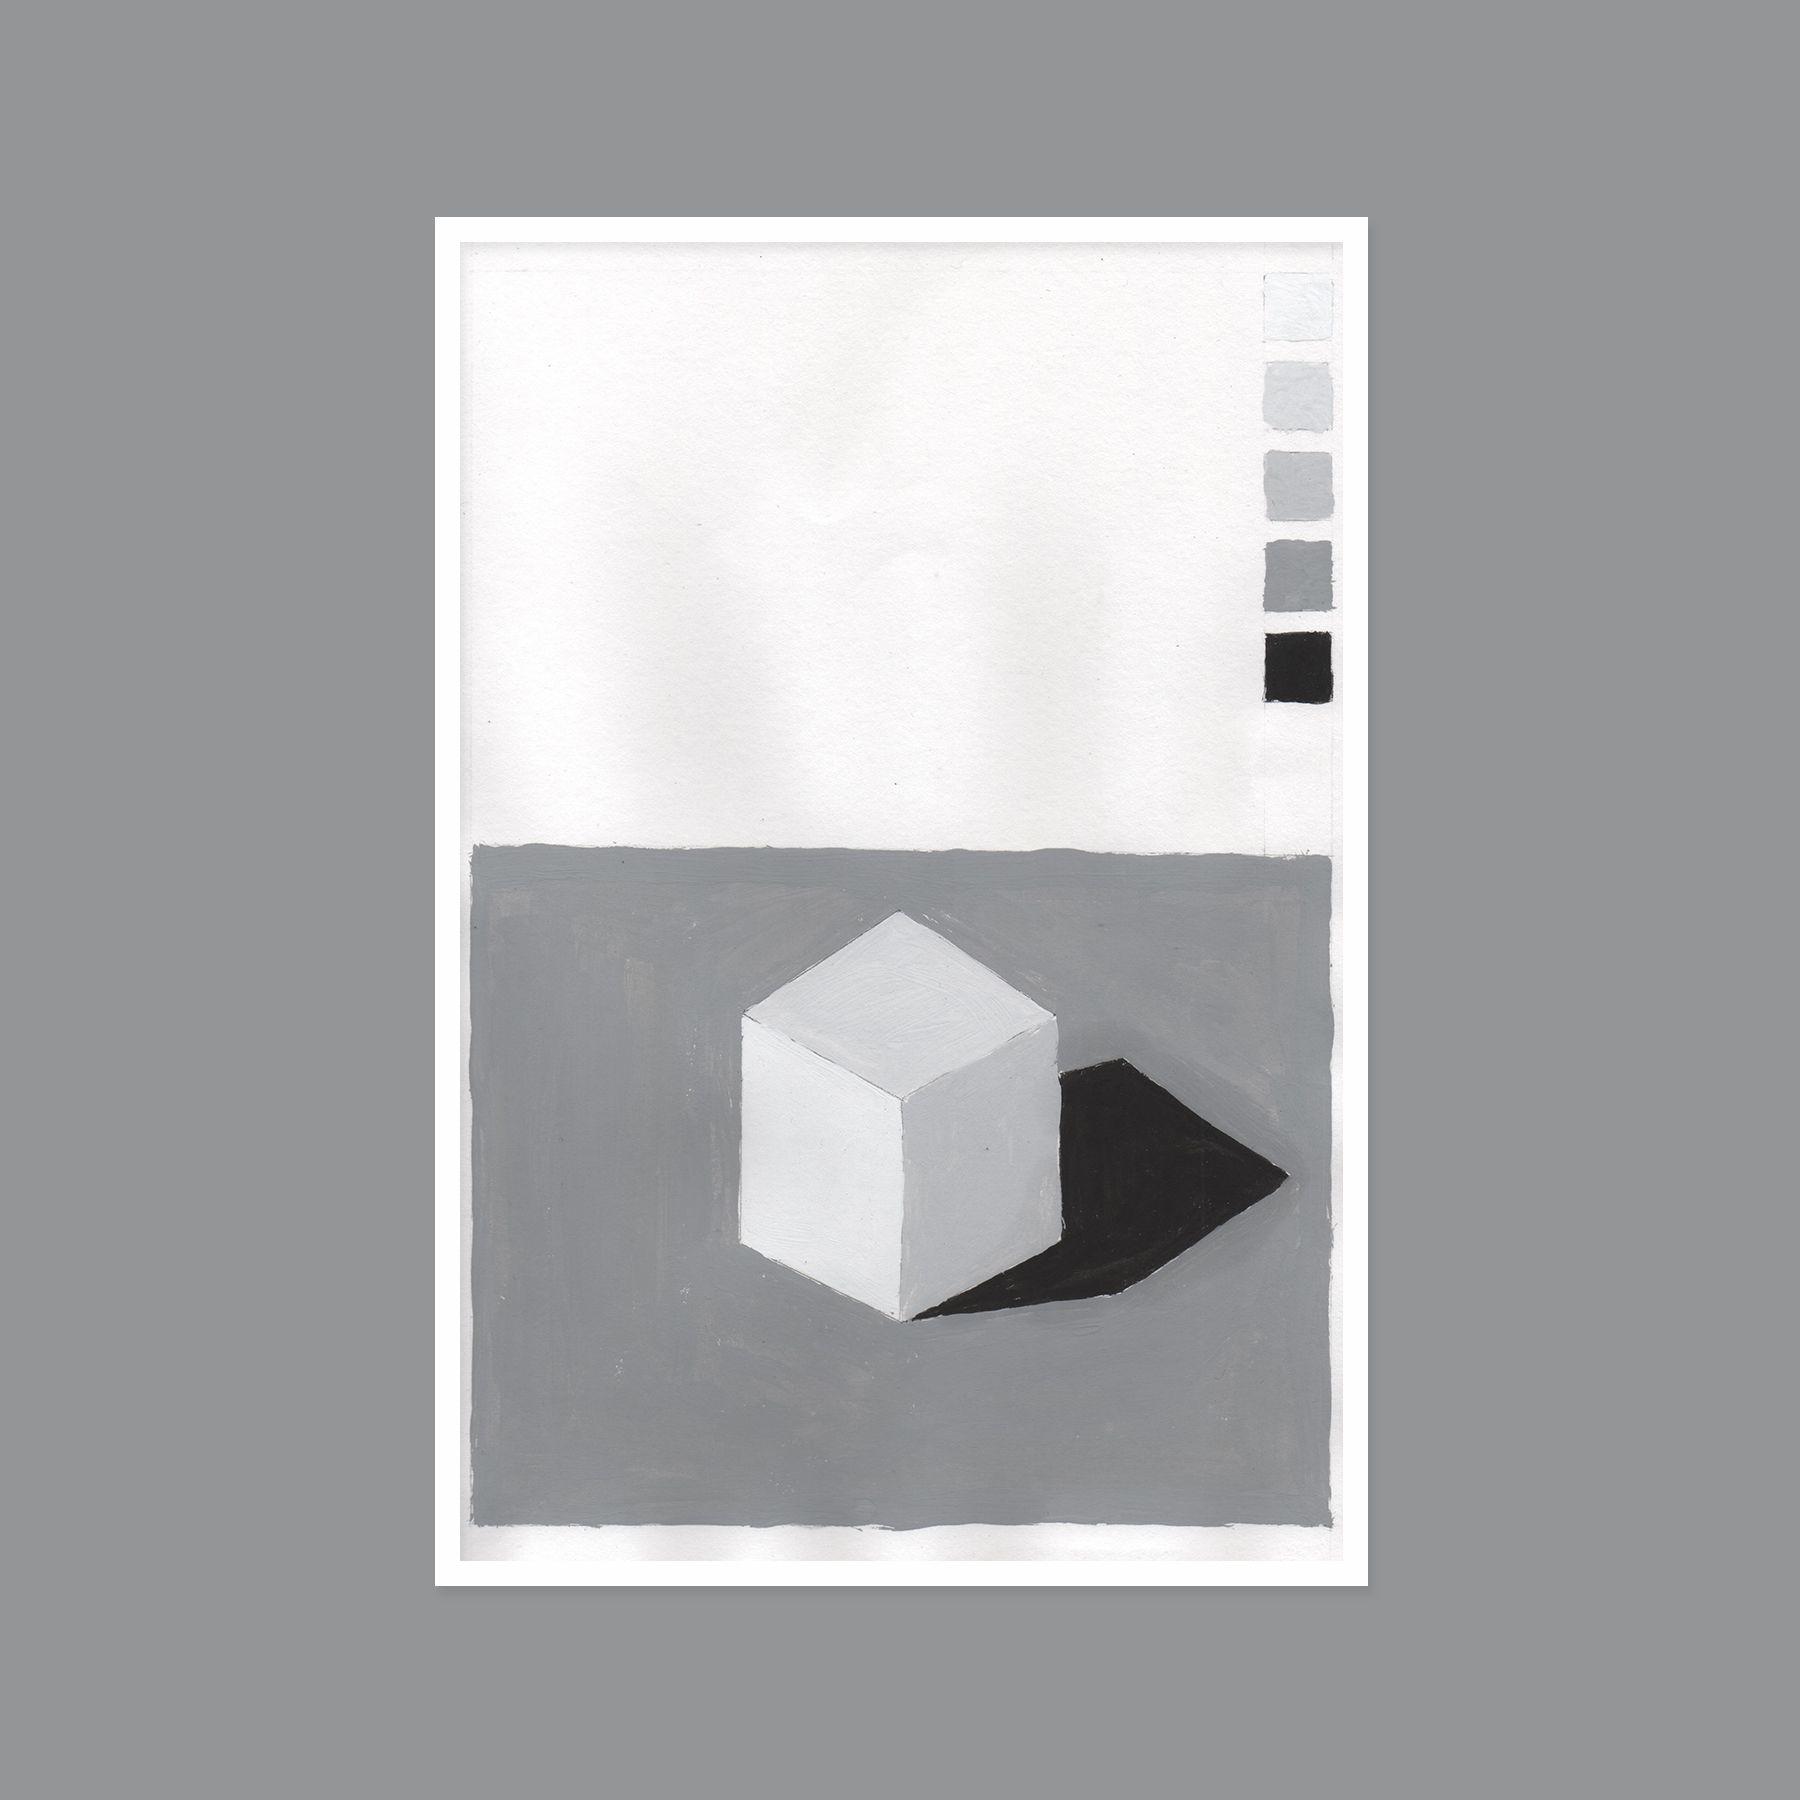 Pintura Con Tempera Cubo Acromatico Edgarcornejo Devcornejo